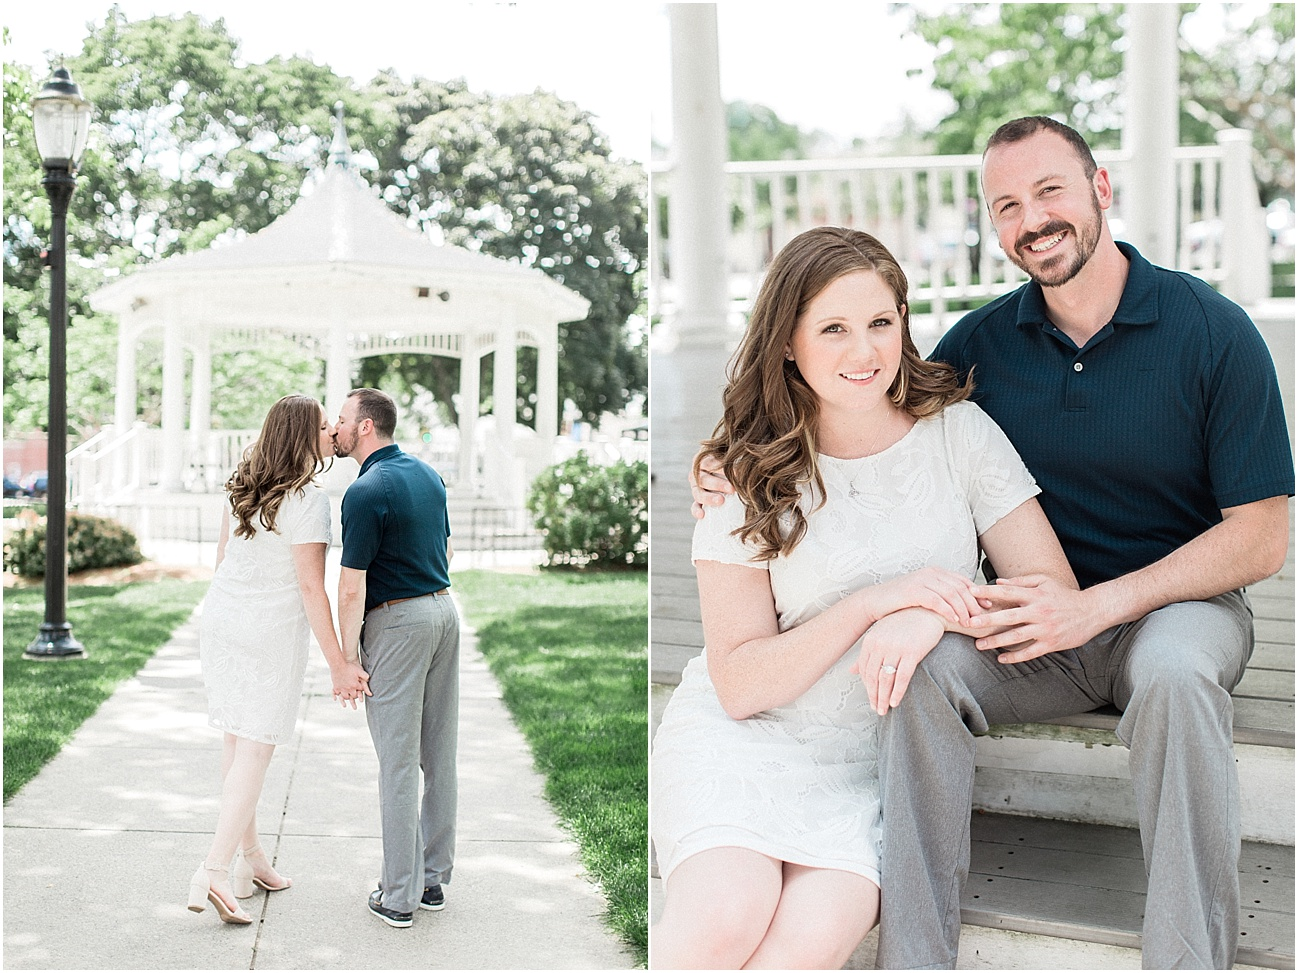 jaclyn_adam_engagement_session_norwood_south_shore_cape_cod_boston_wedding_photographer_meredith_jane_photography_photo_0312.jpg